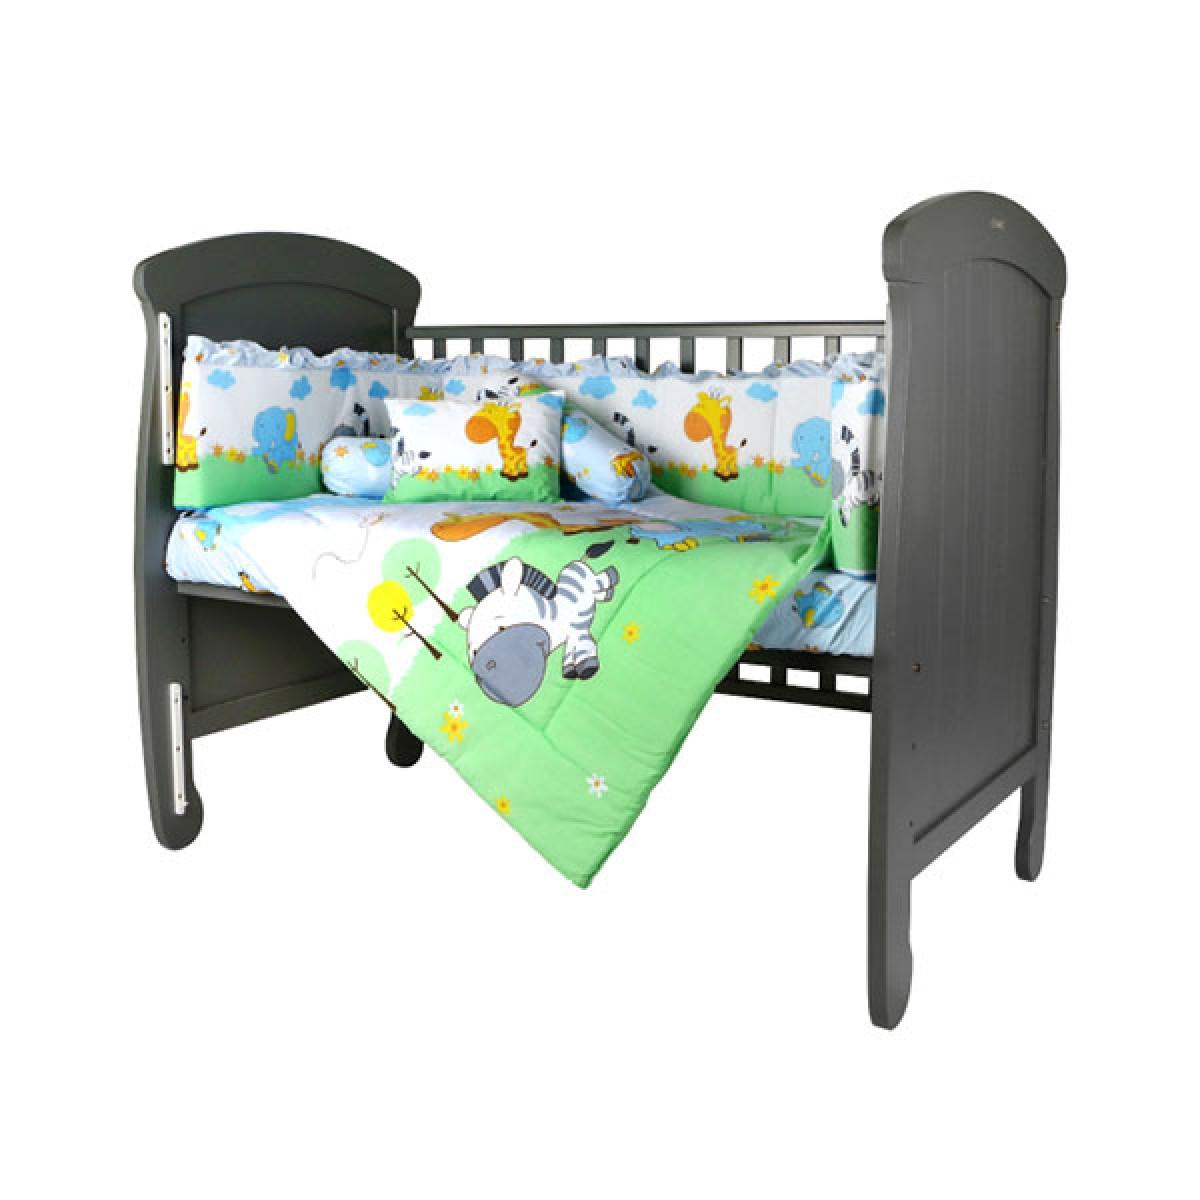 Lecy Bedding Set - Kico Baby Center